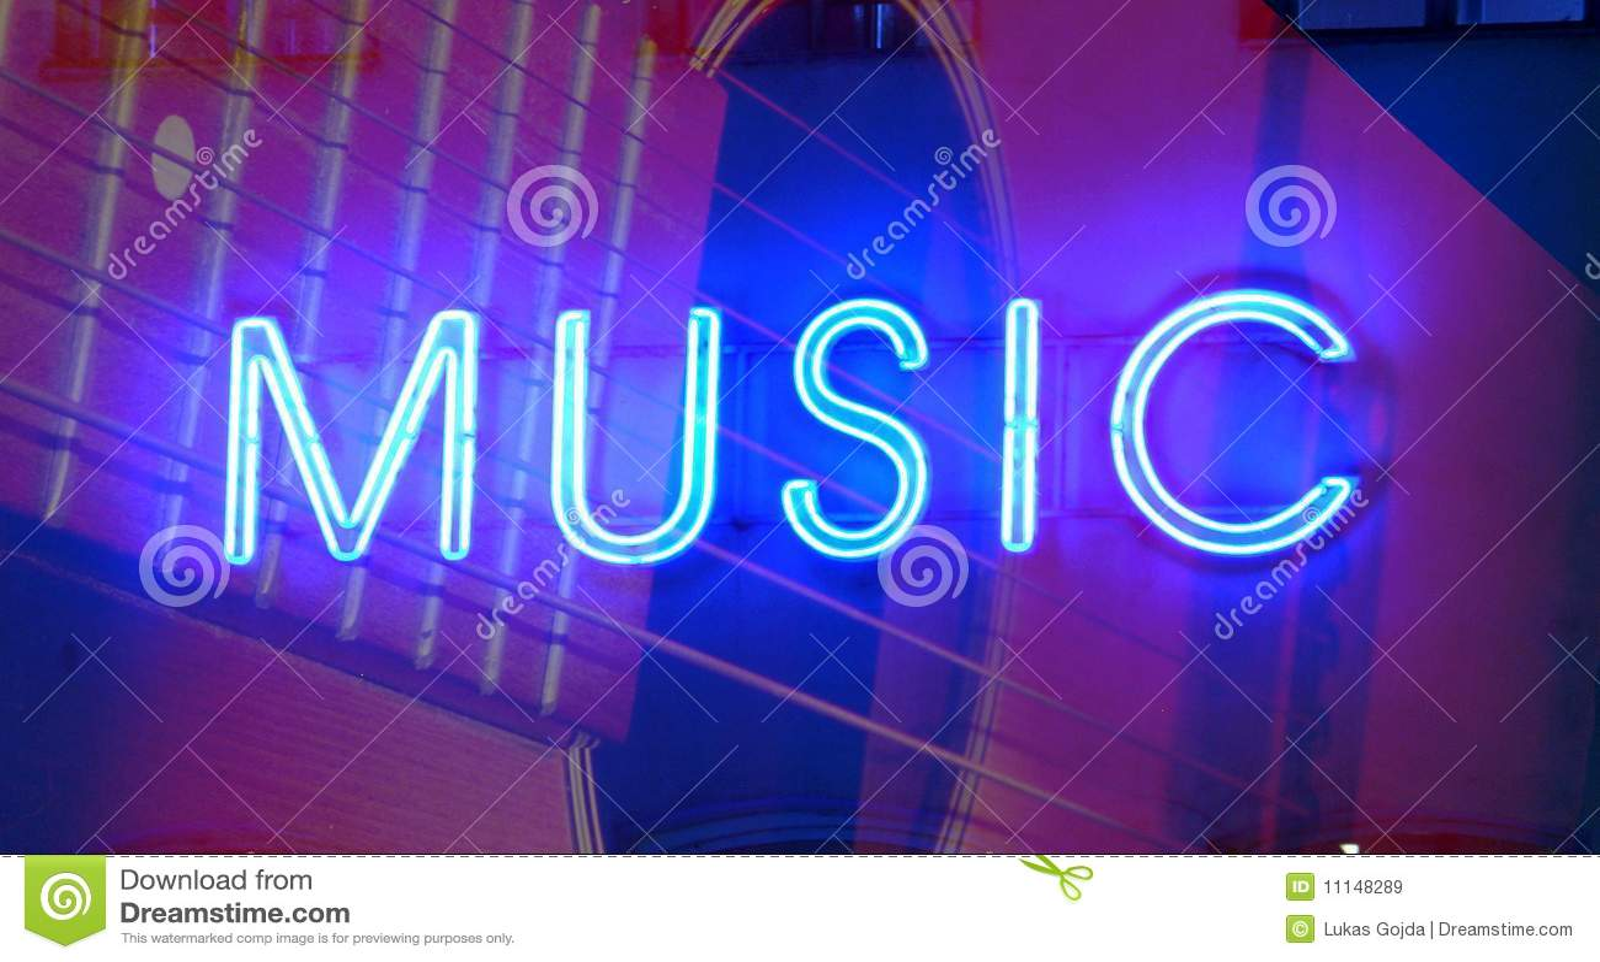 Neon music sign stock image  Image of closeup, shop, blue